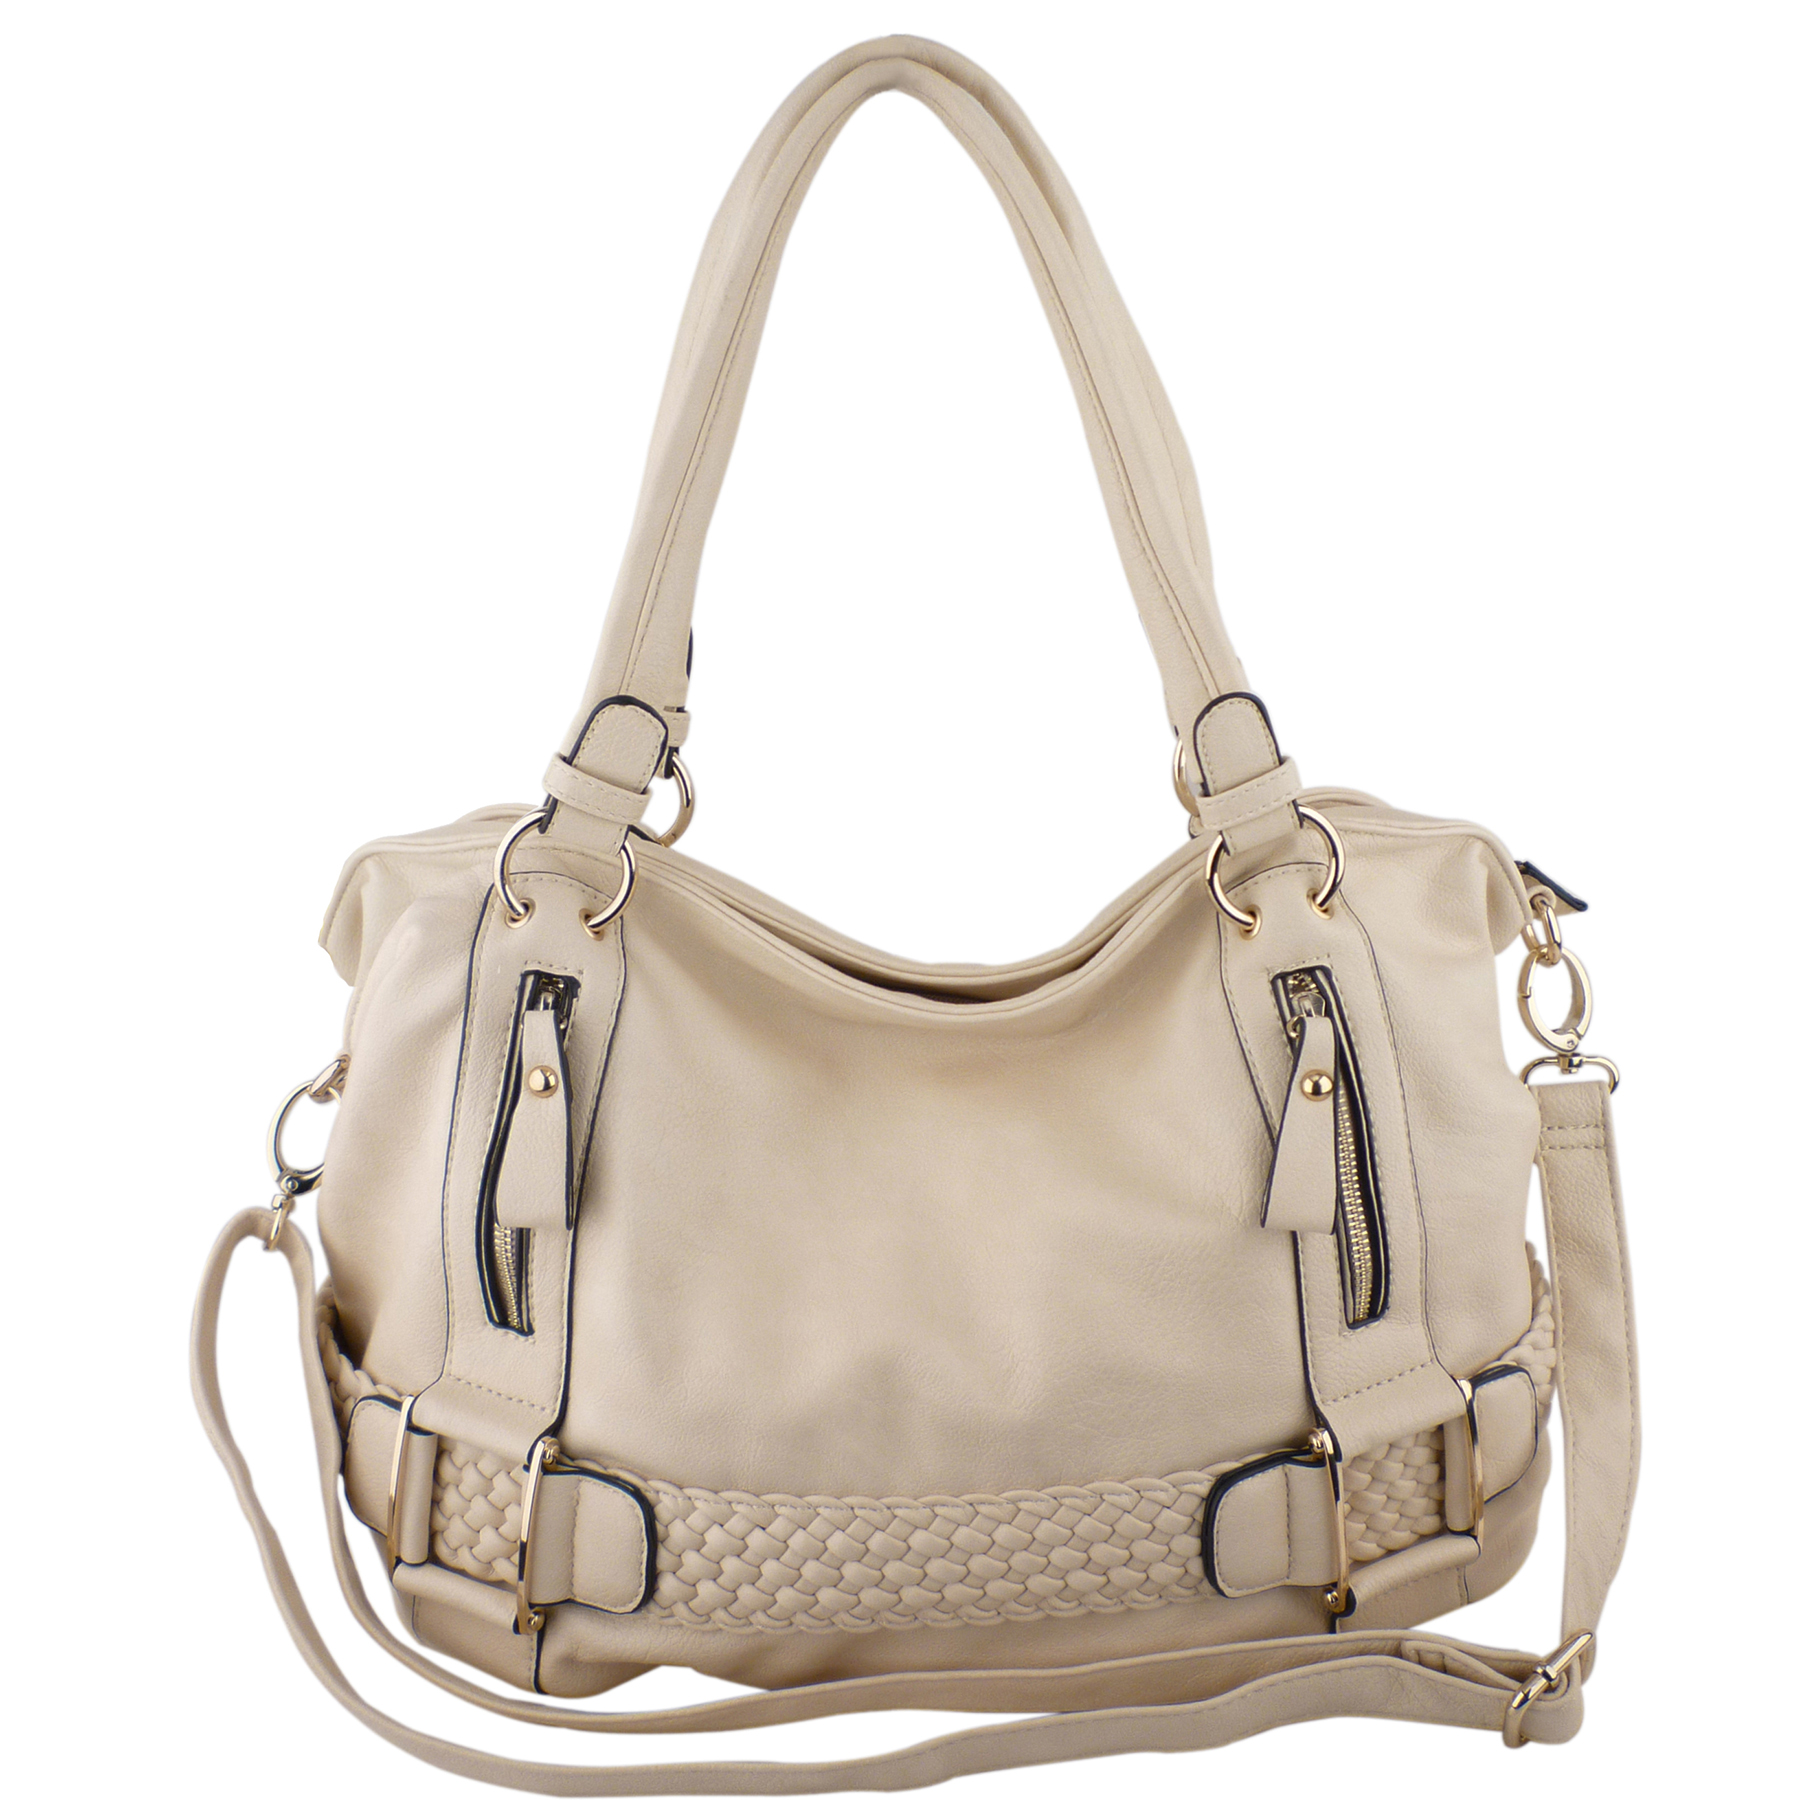 SAMANTHA Cream Weave Pattern Soft Hobo Handbag Front